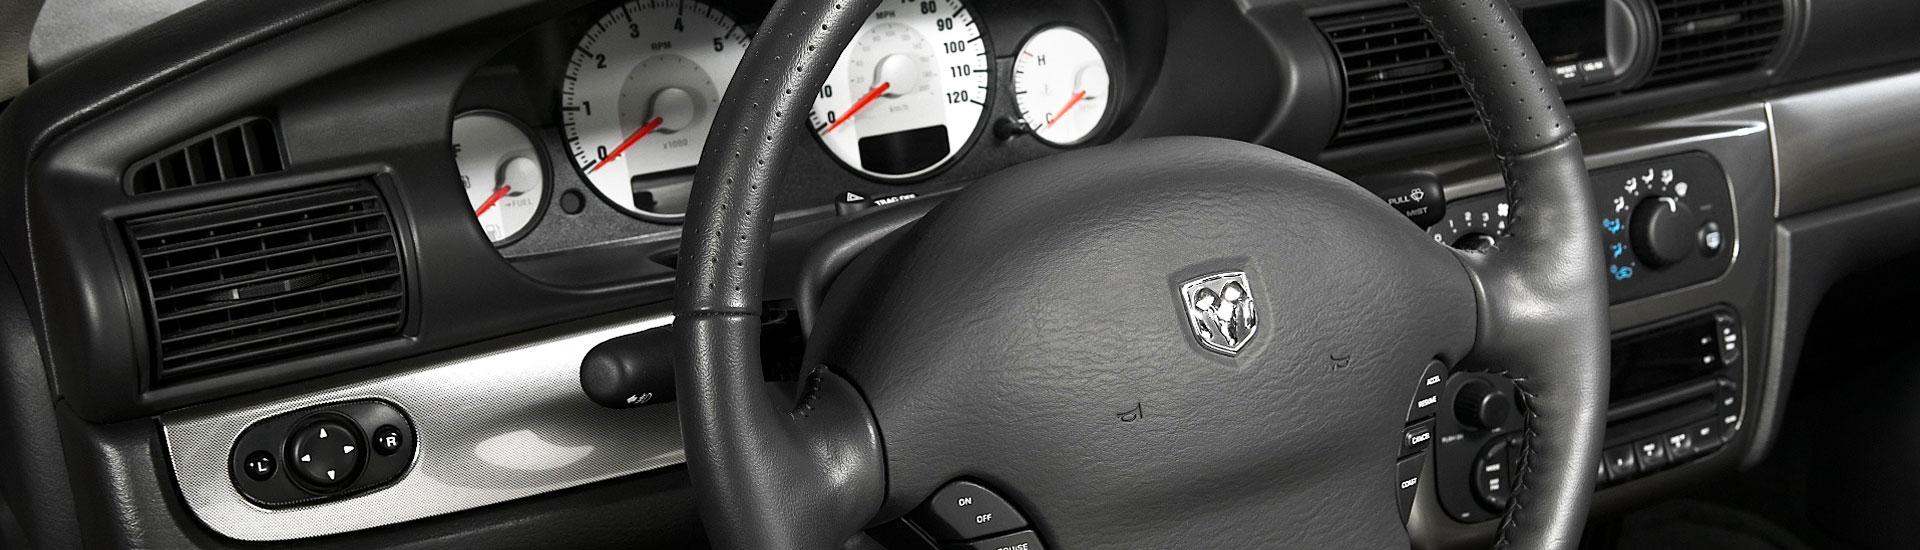 Dodge stratus custom dash kits